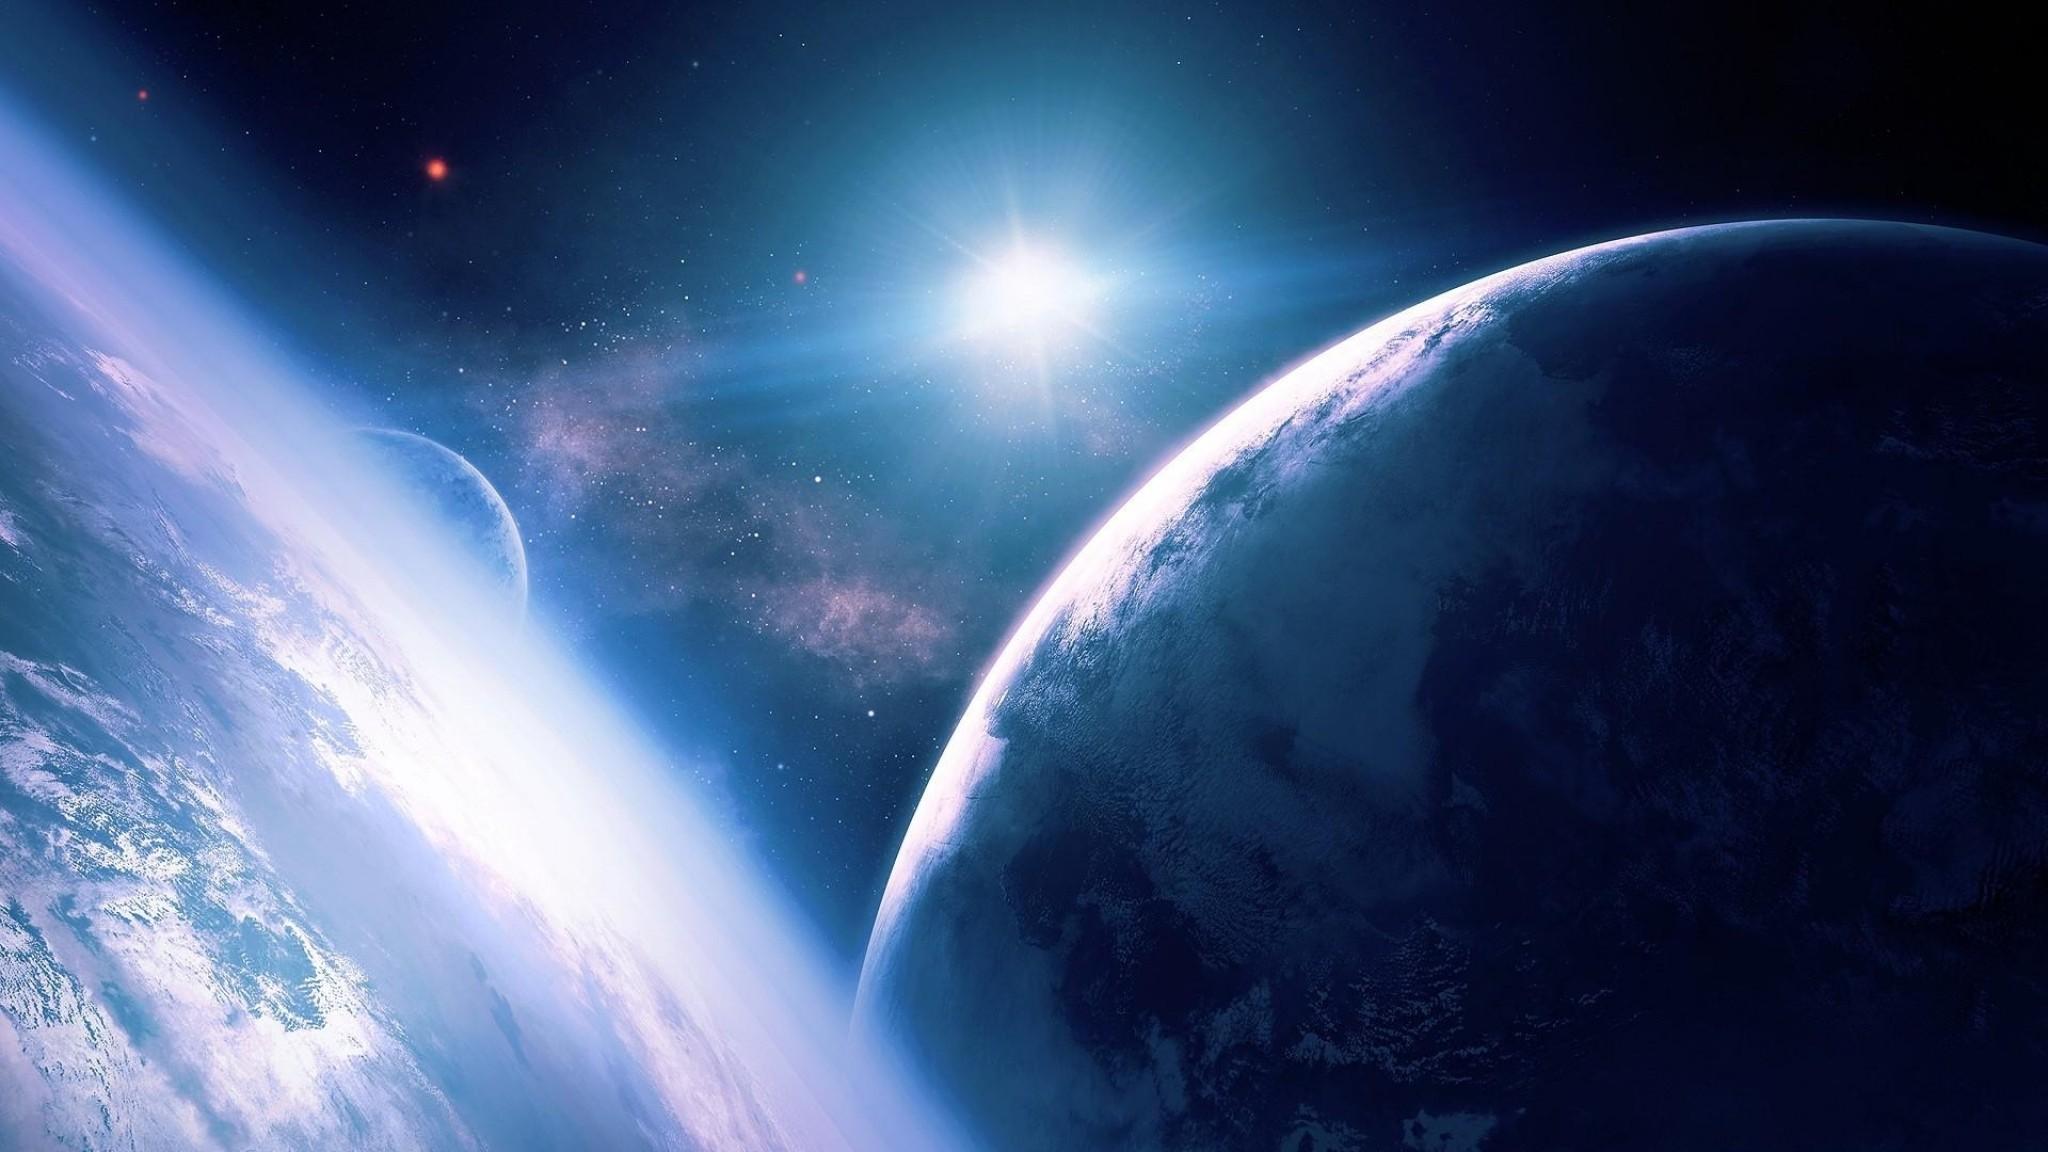 Wallpaper planets, stars, rays, galaxy